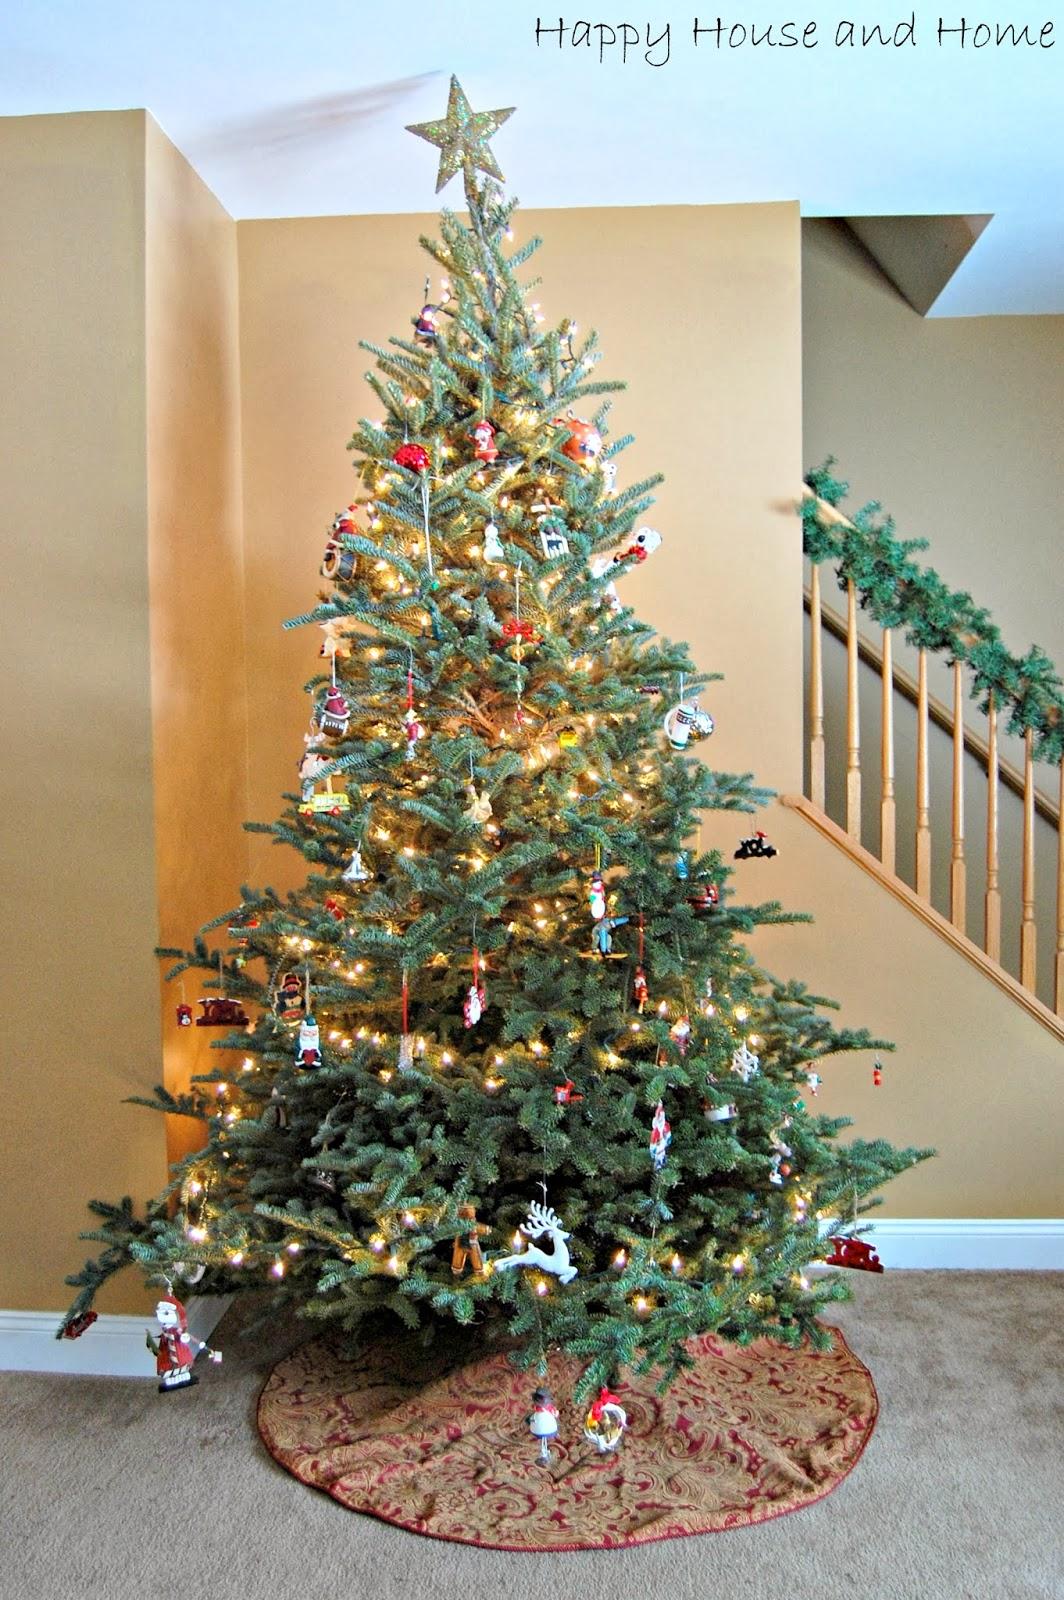 Happy House and Home: (DOH) Christmas Tree, (DOH) Christmas Tree